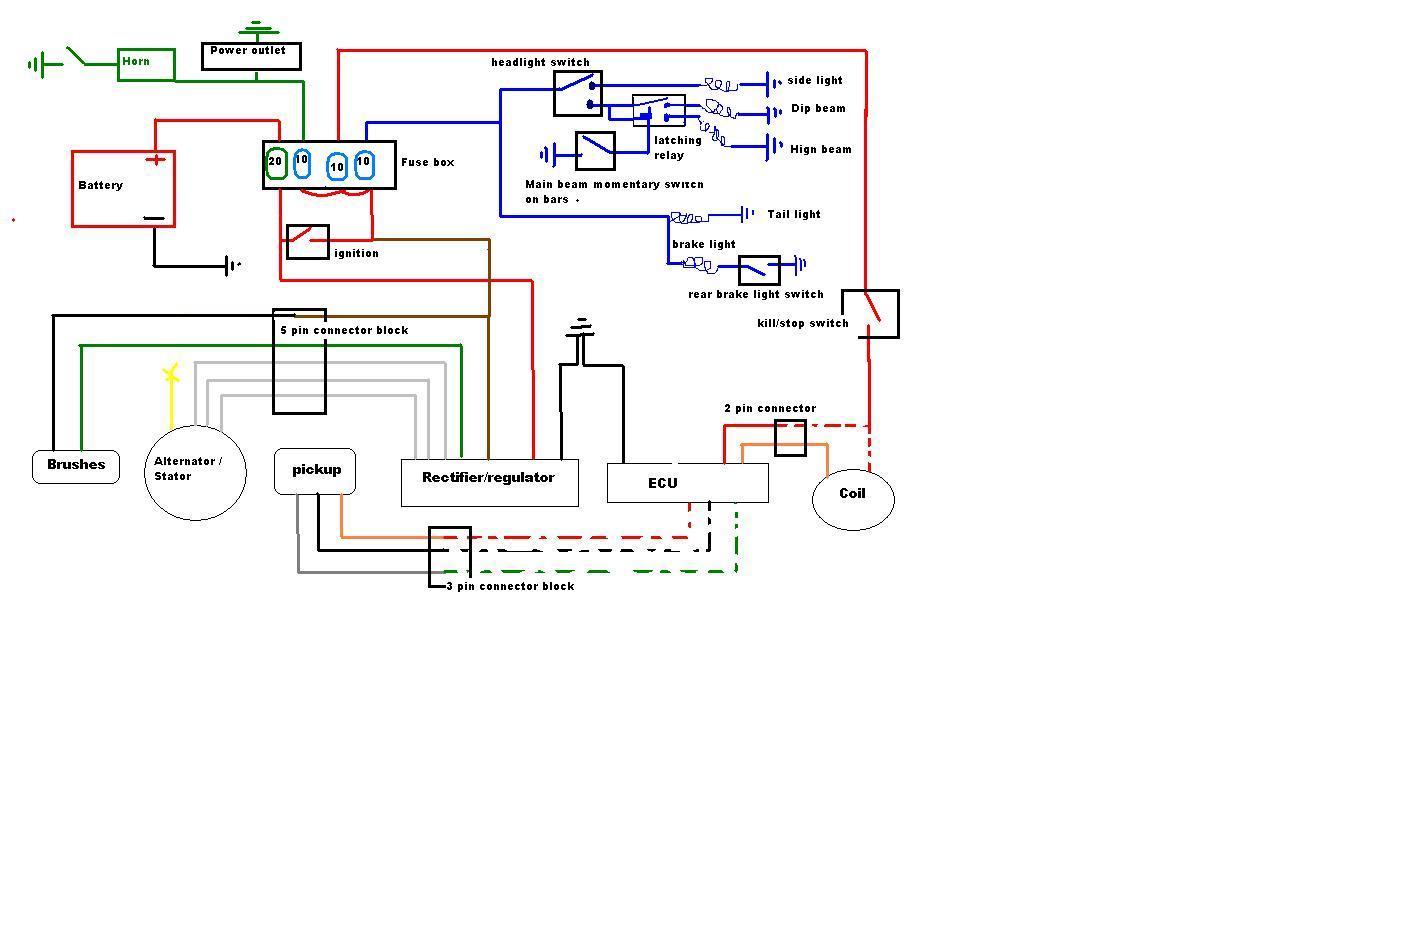 Xt350 Wiring Diagram Library Transmission On Yamaha Moto 4 1985 1975 Dt250